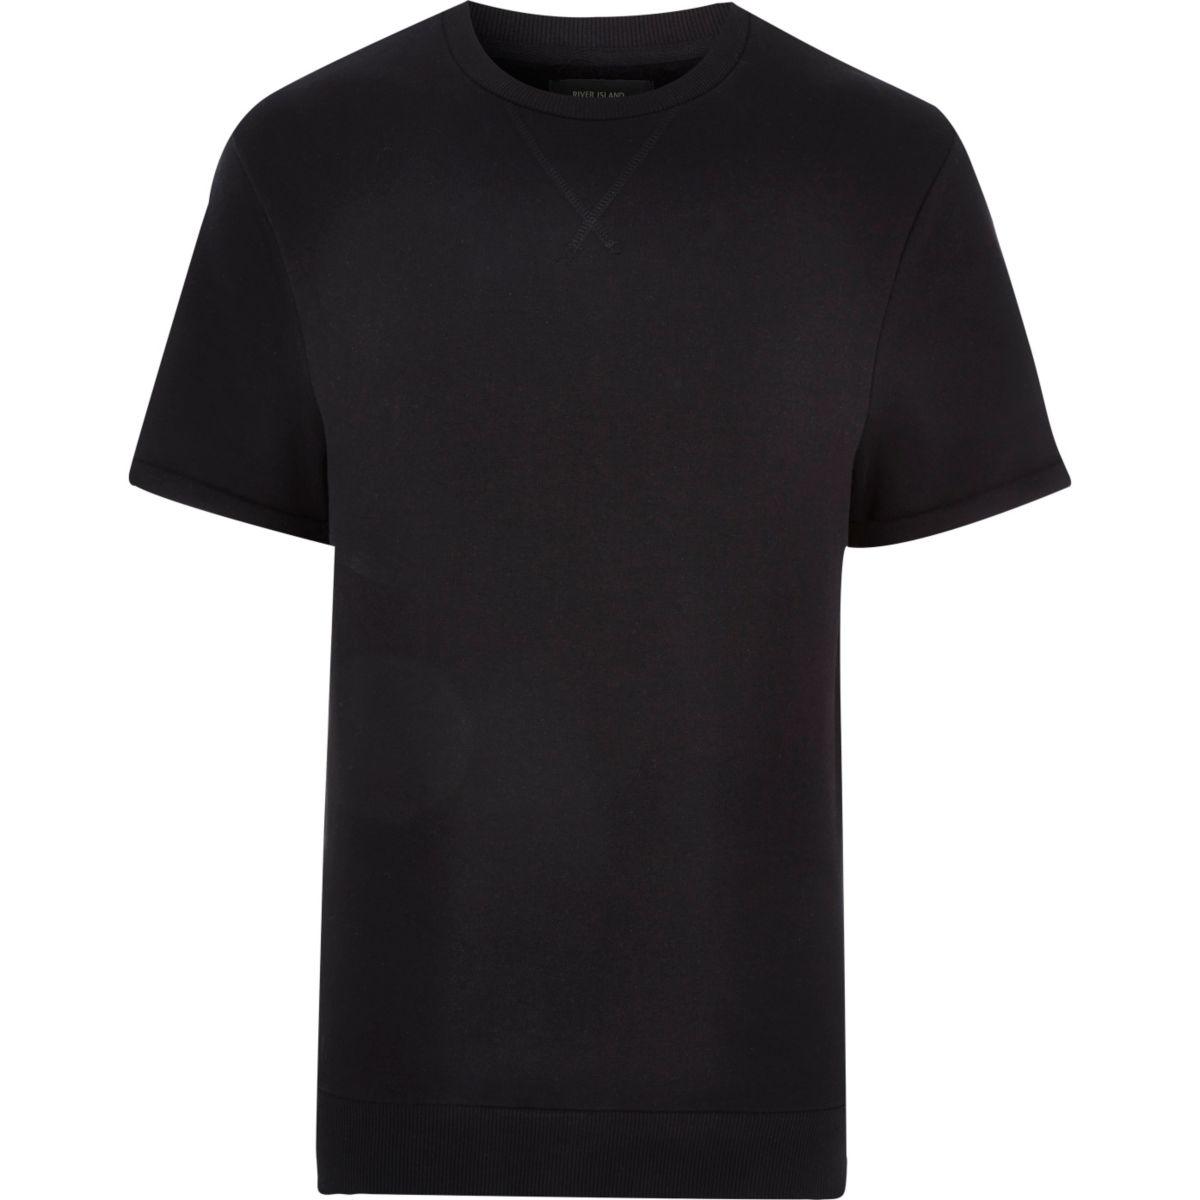 Black turn up short sleeve sweatshirt